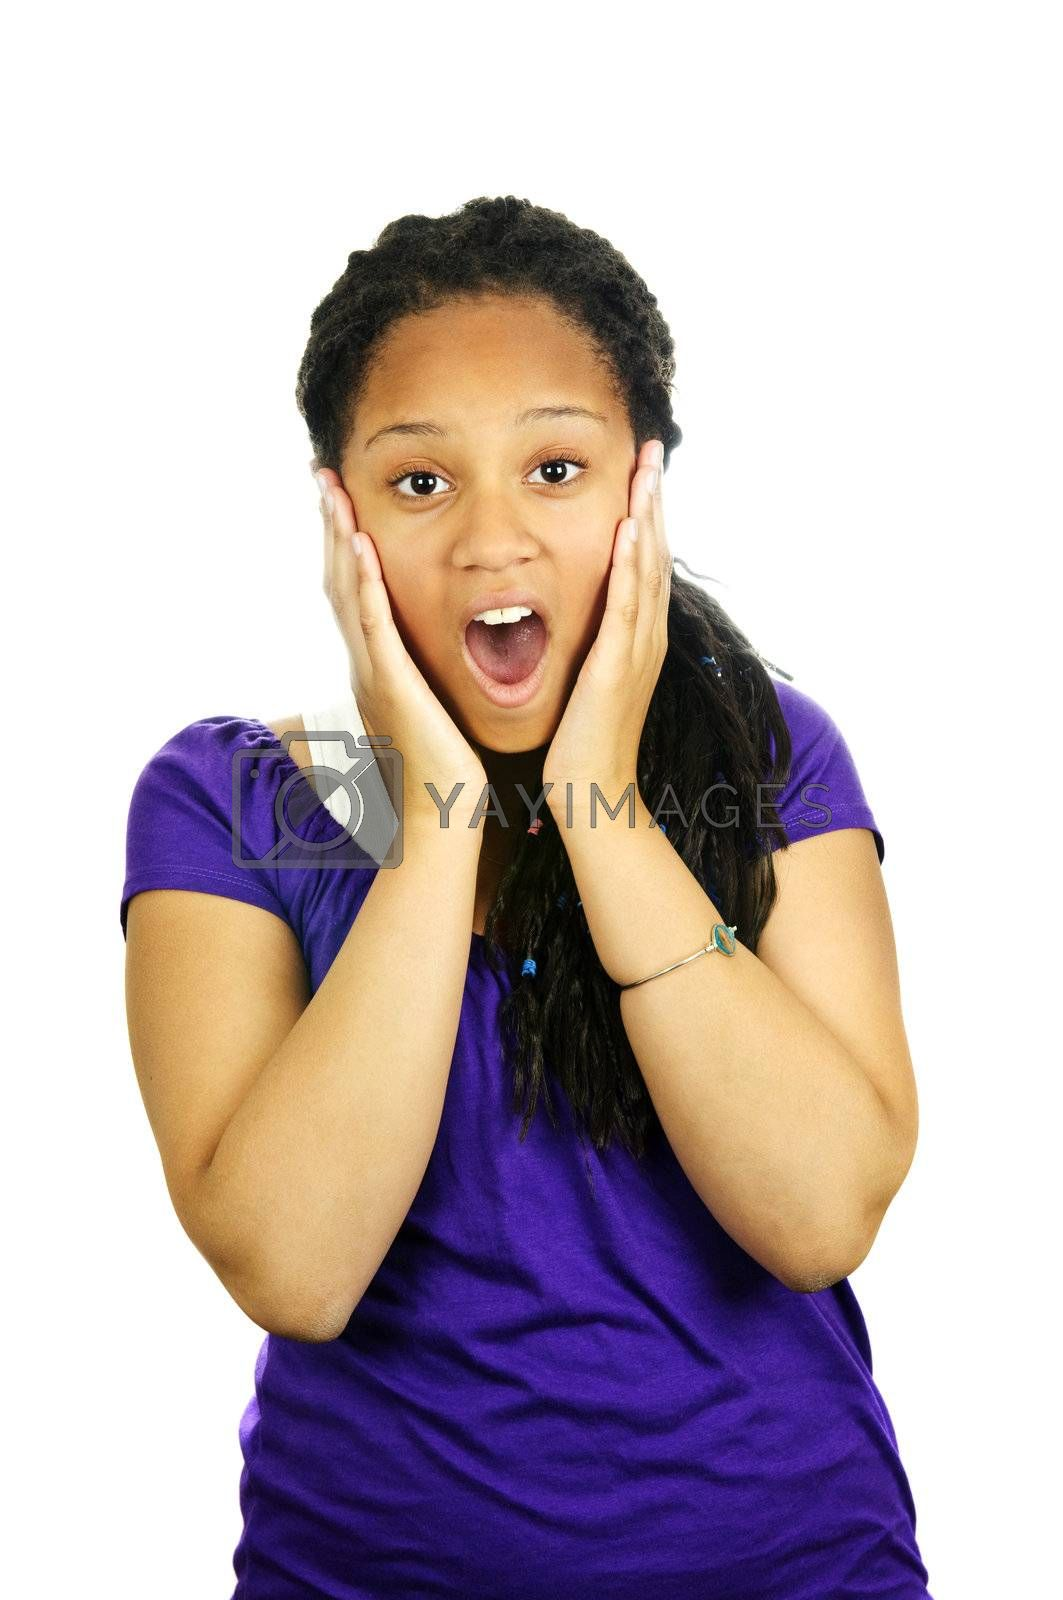 Royalty free image of Teenage girl surprised by elenathewise